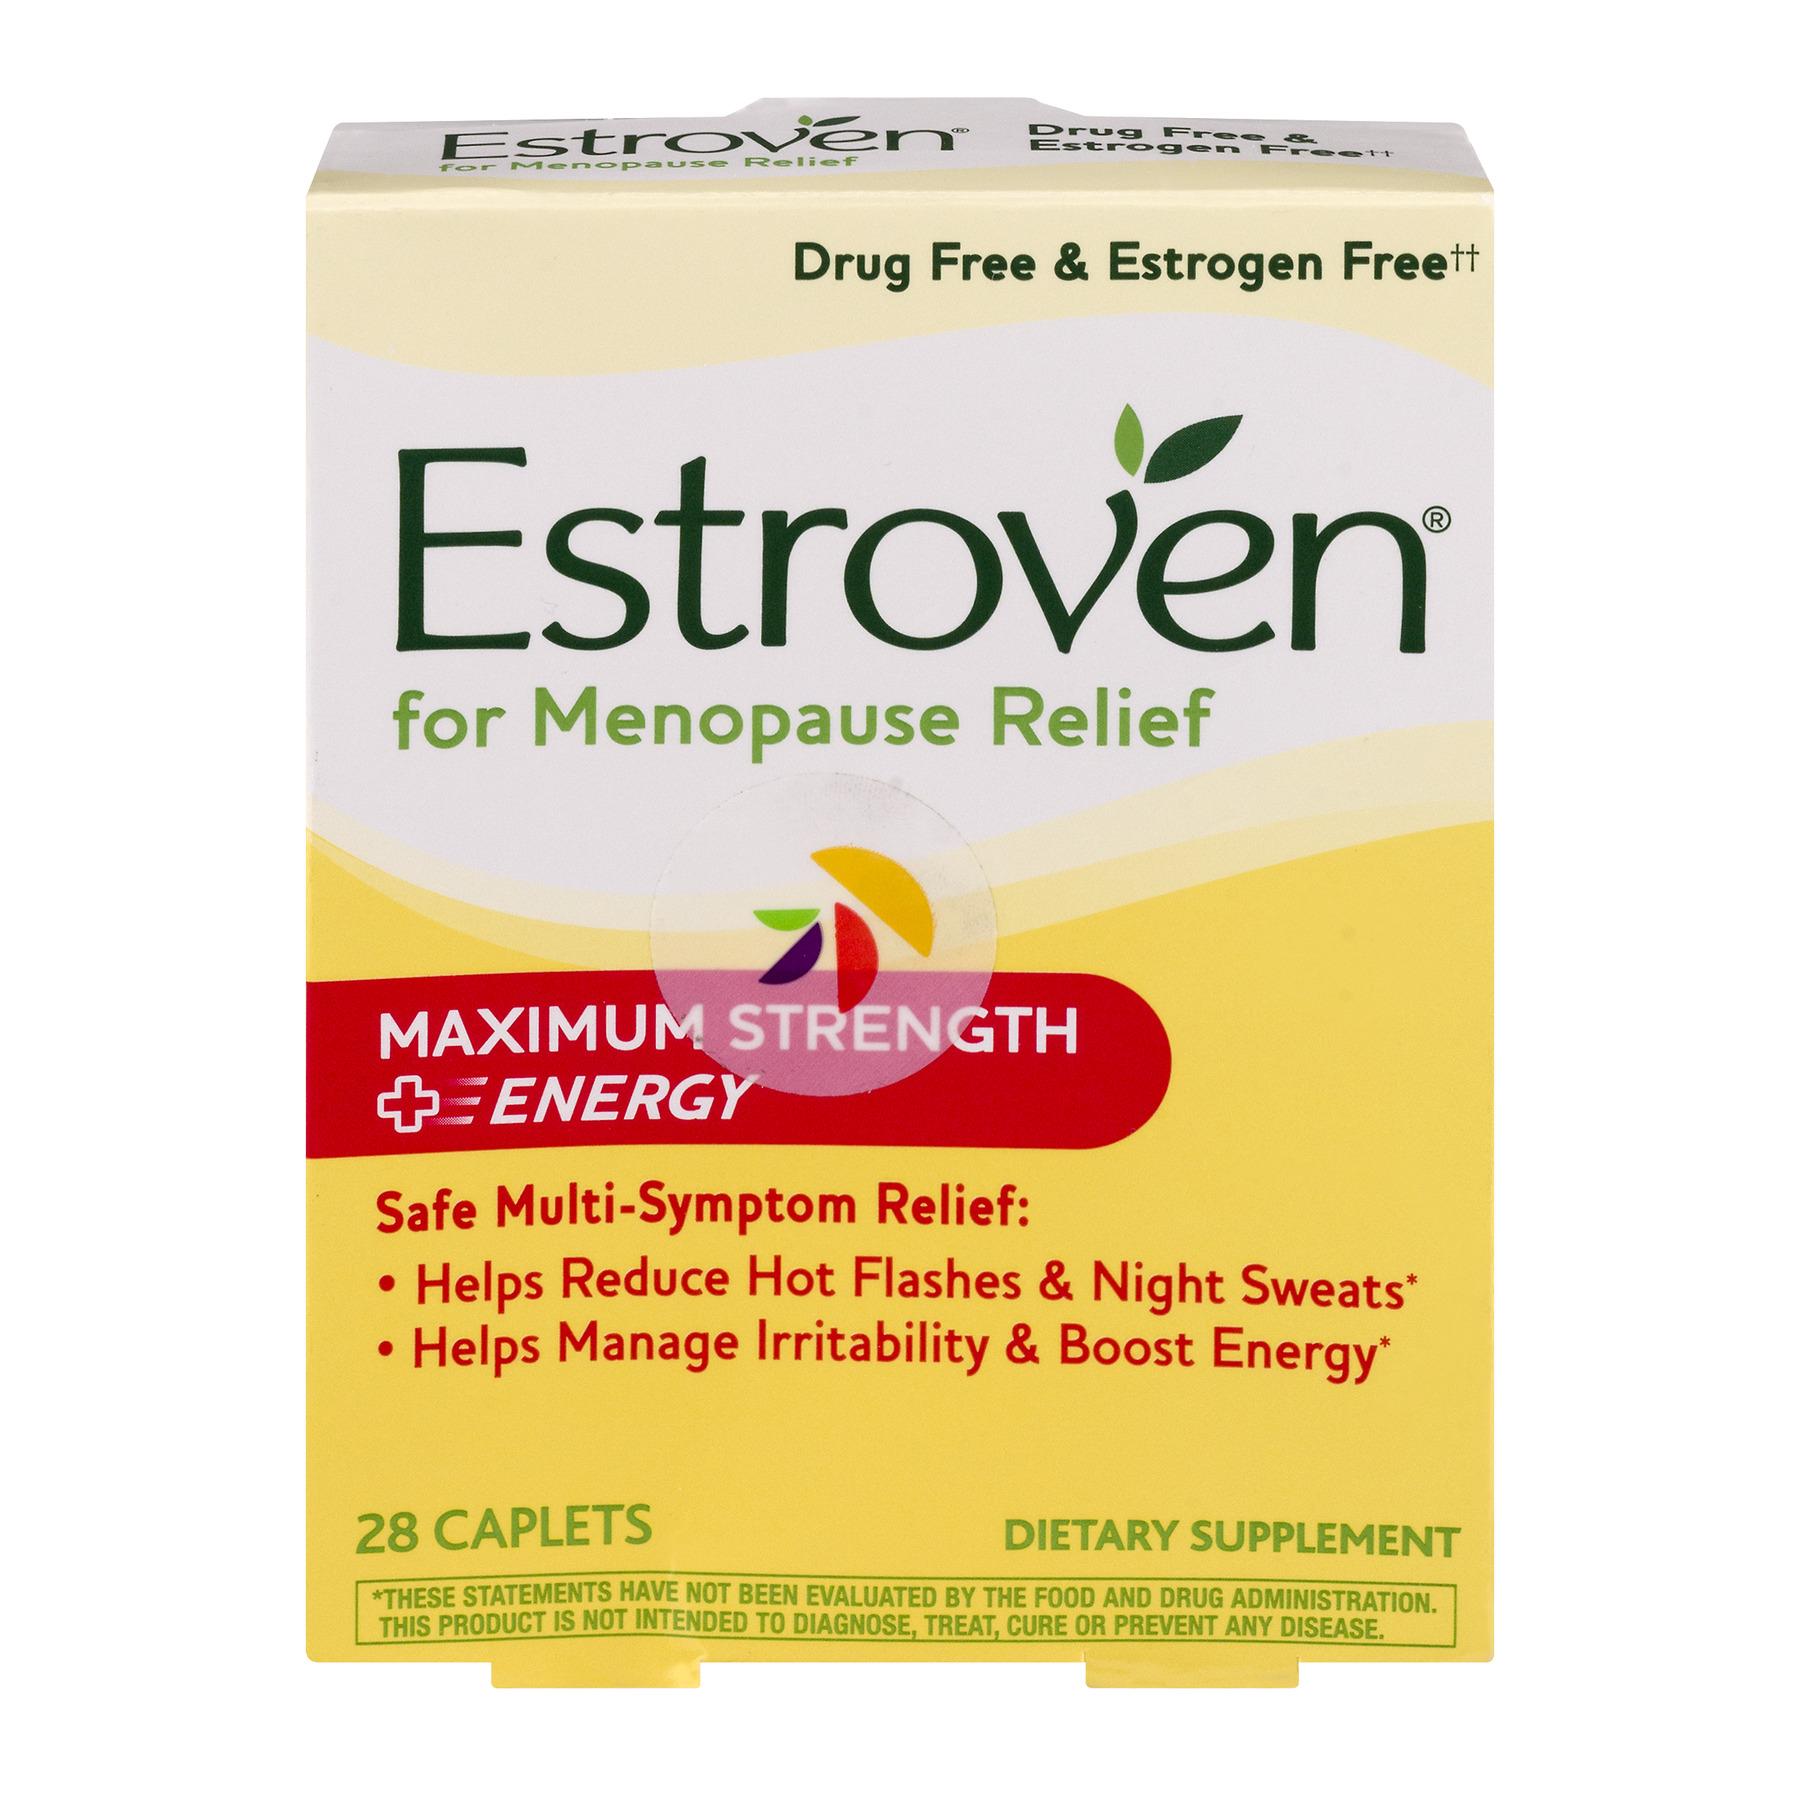 Estroven Maximum Strength + Energy for Menopause Relief Caplets, 28 count